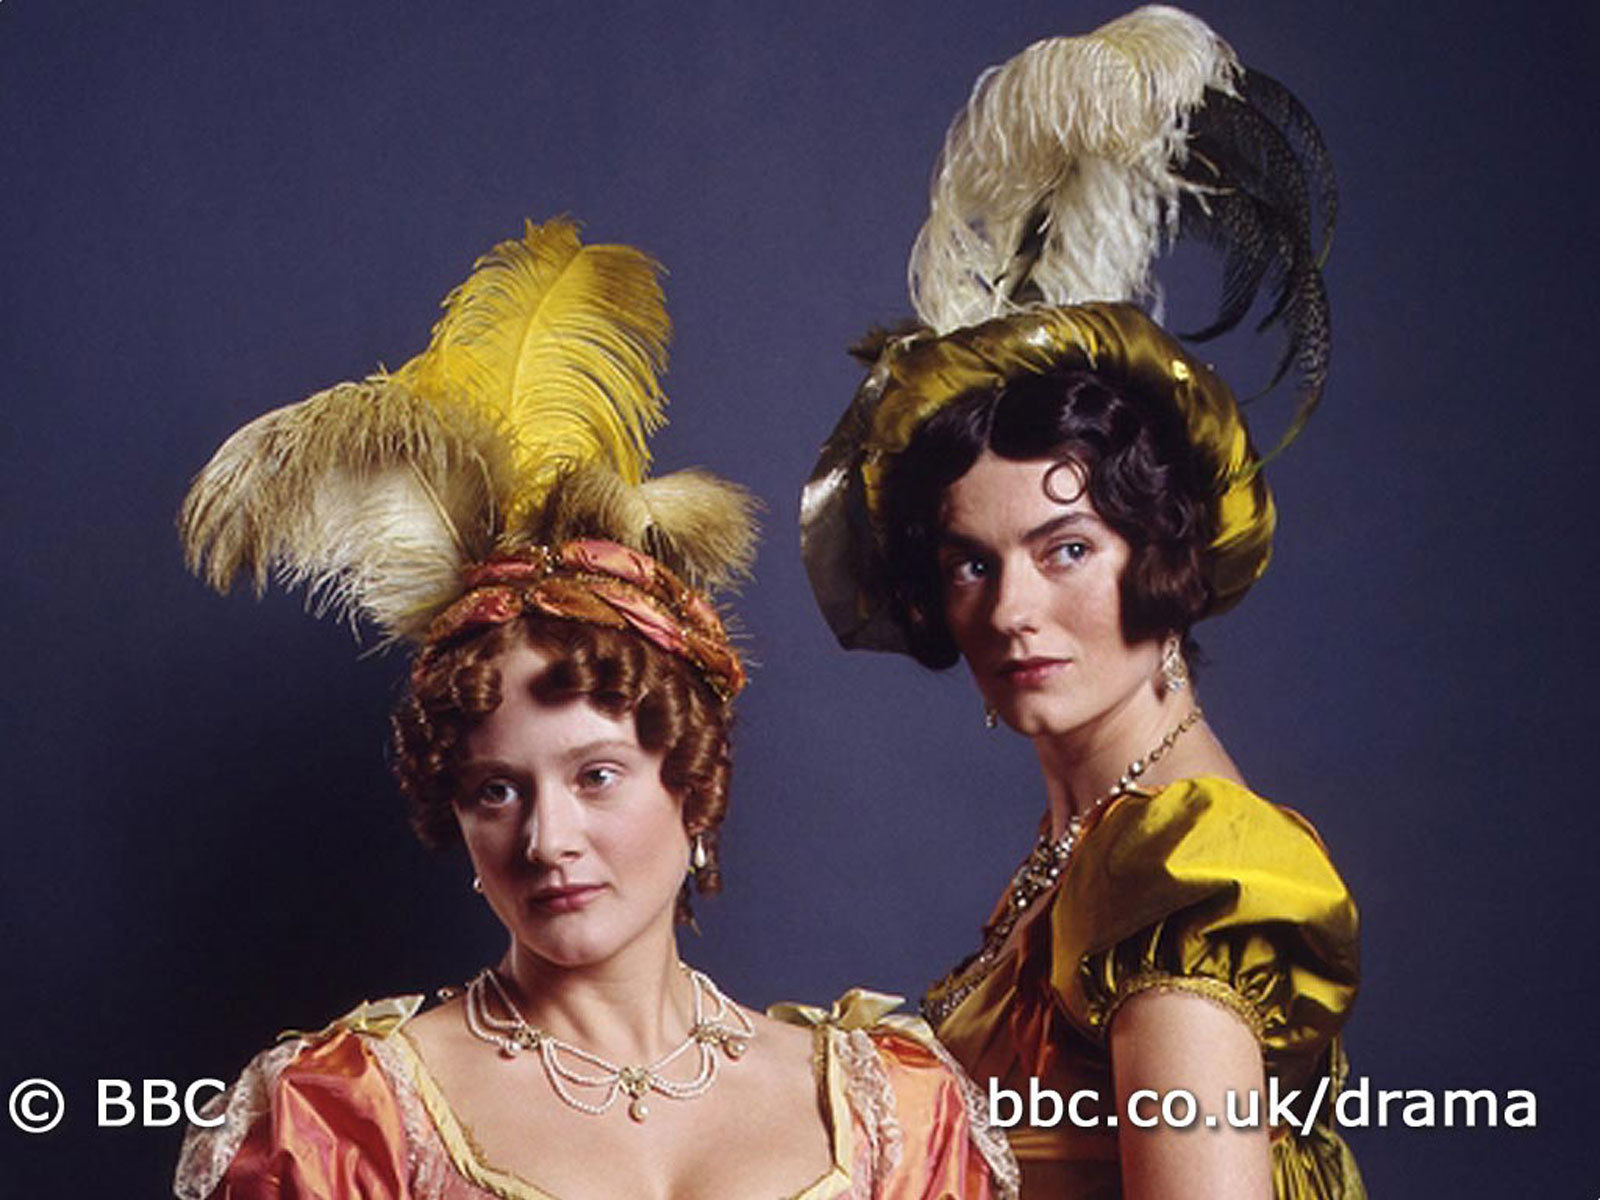 Mrs. Hurst and Miss Bingley